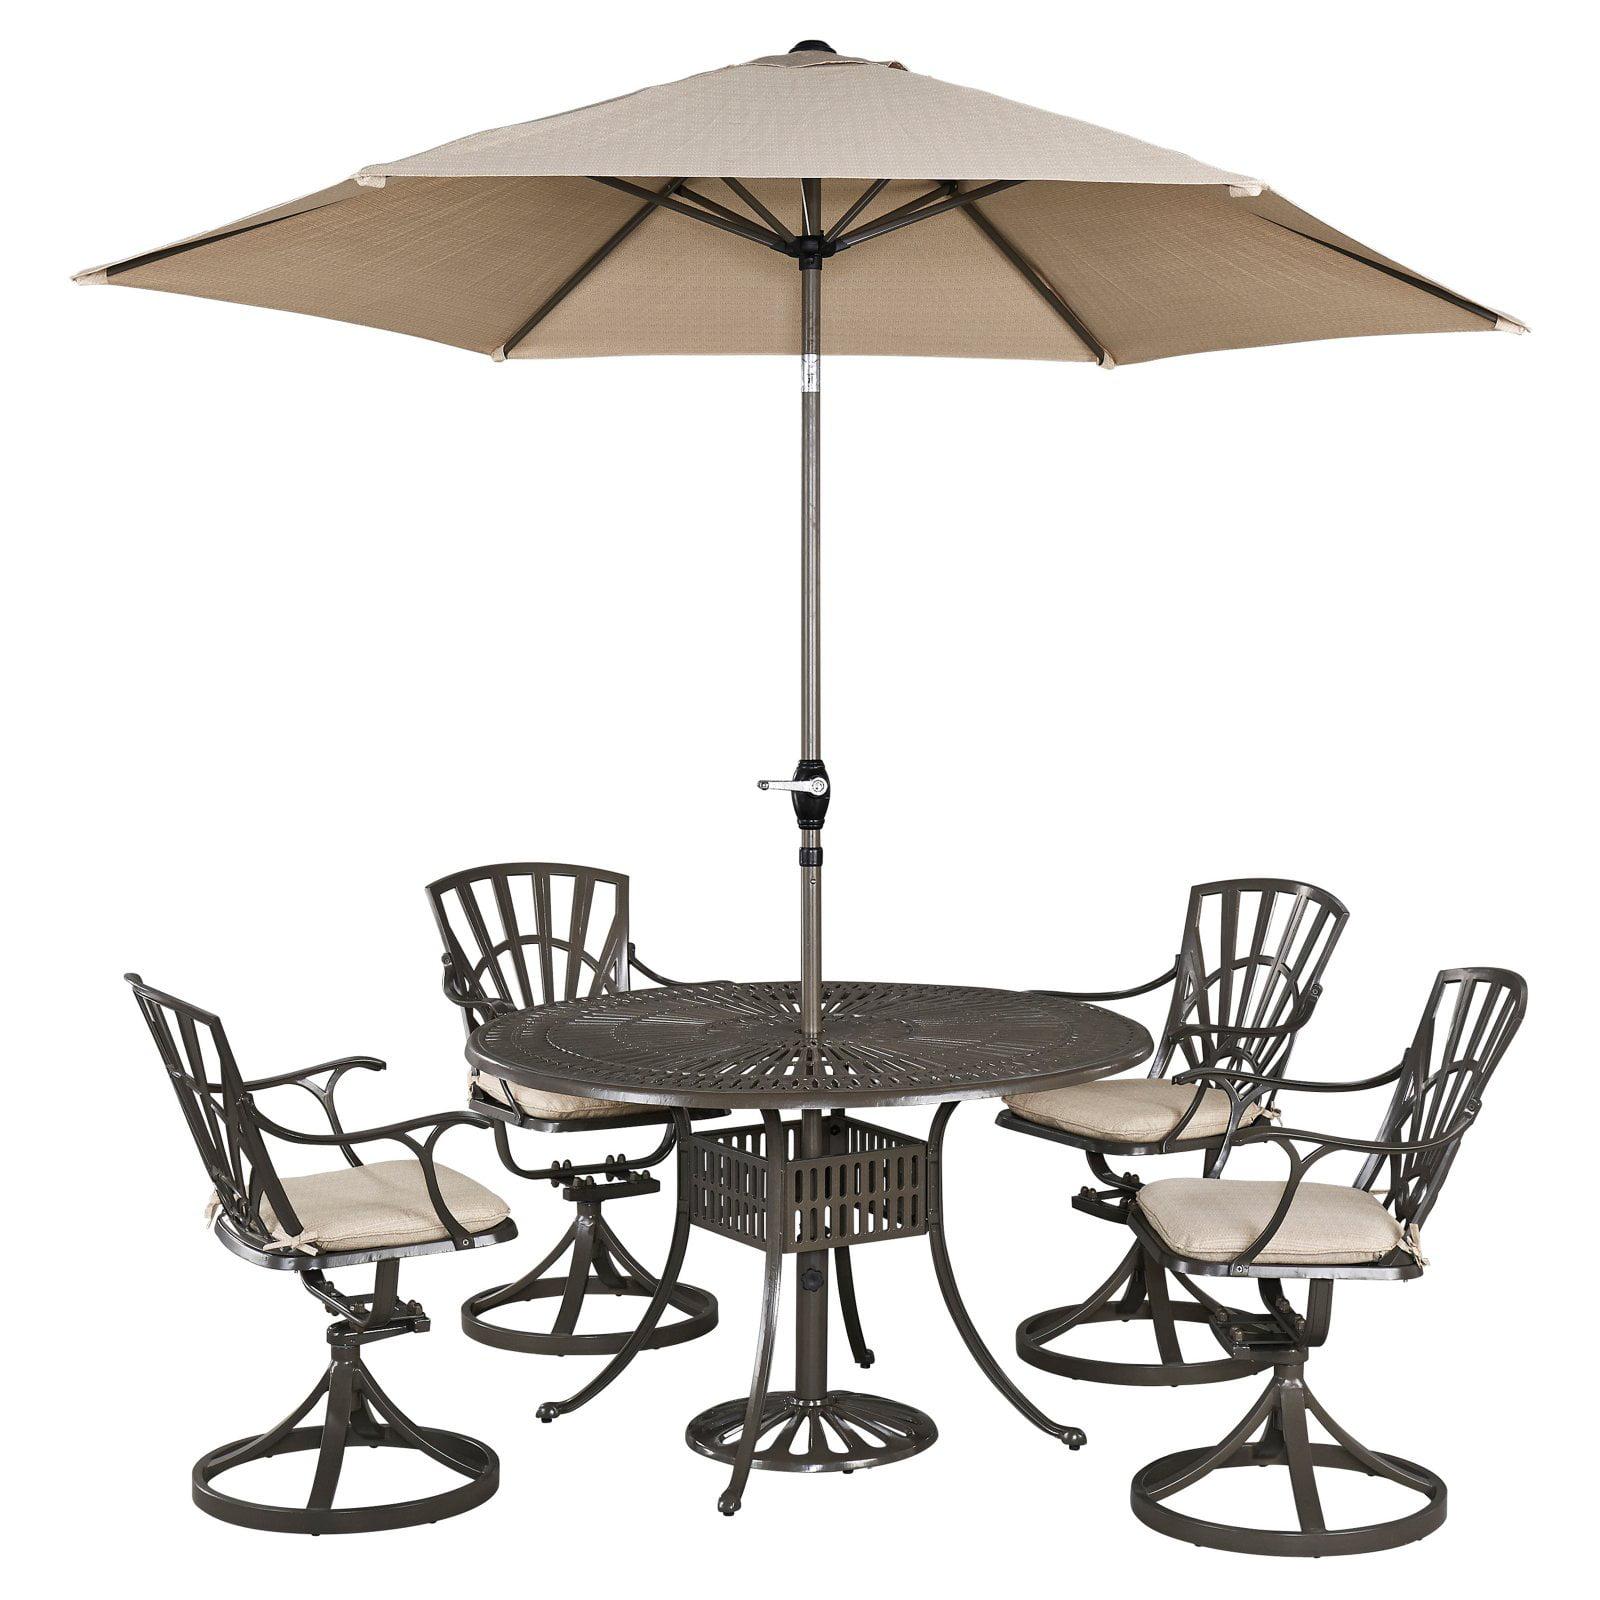 Largo 5PC Dining Set w/ Umbrella and Cushions